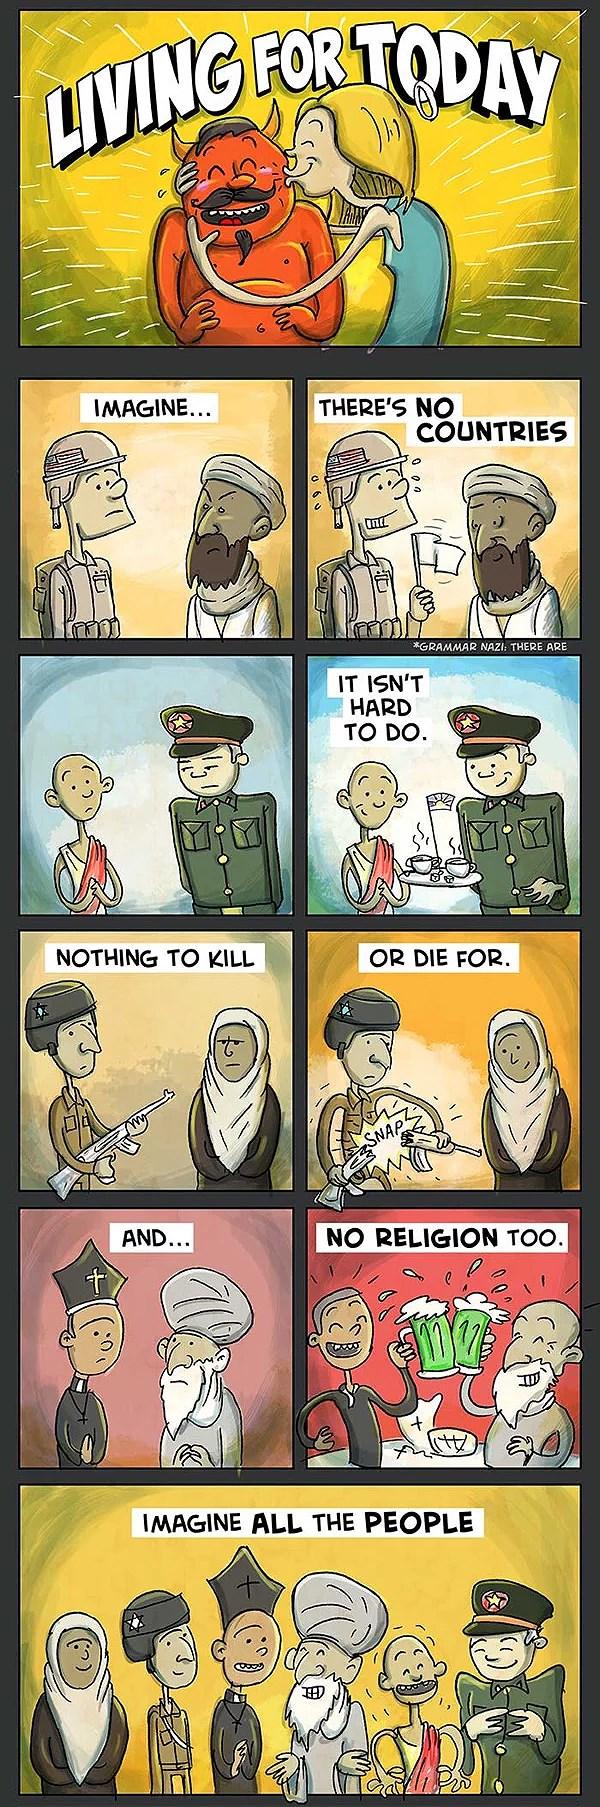 sg0li-imagine-cartoon2